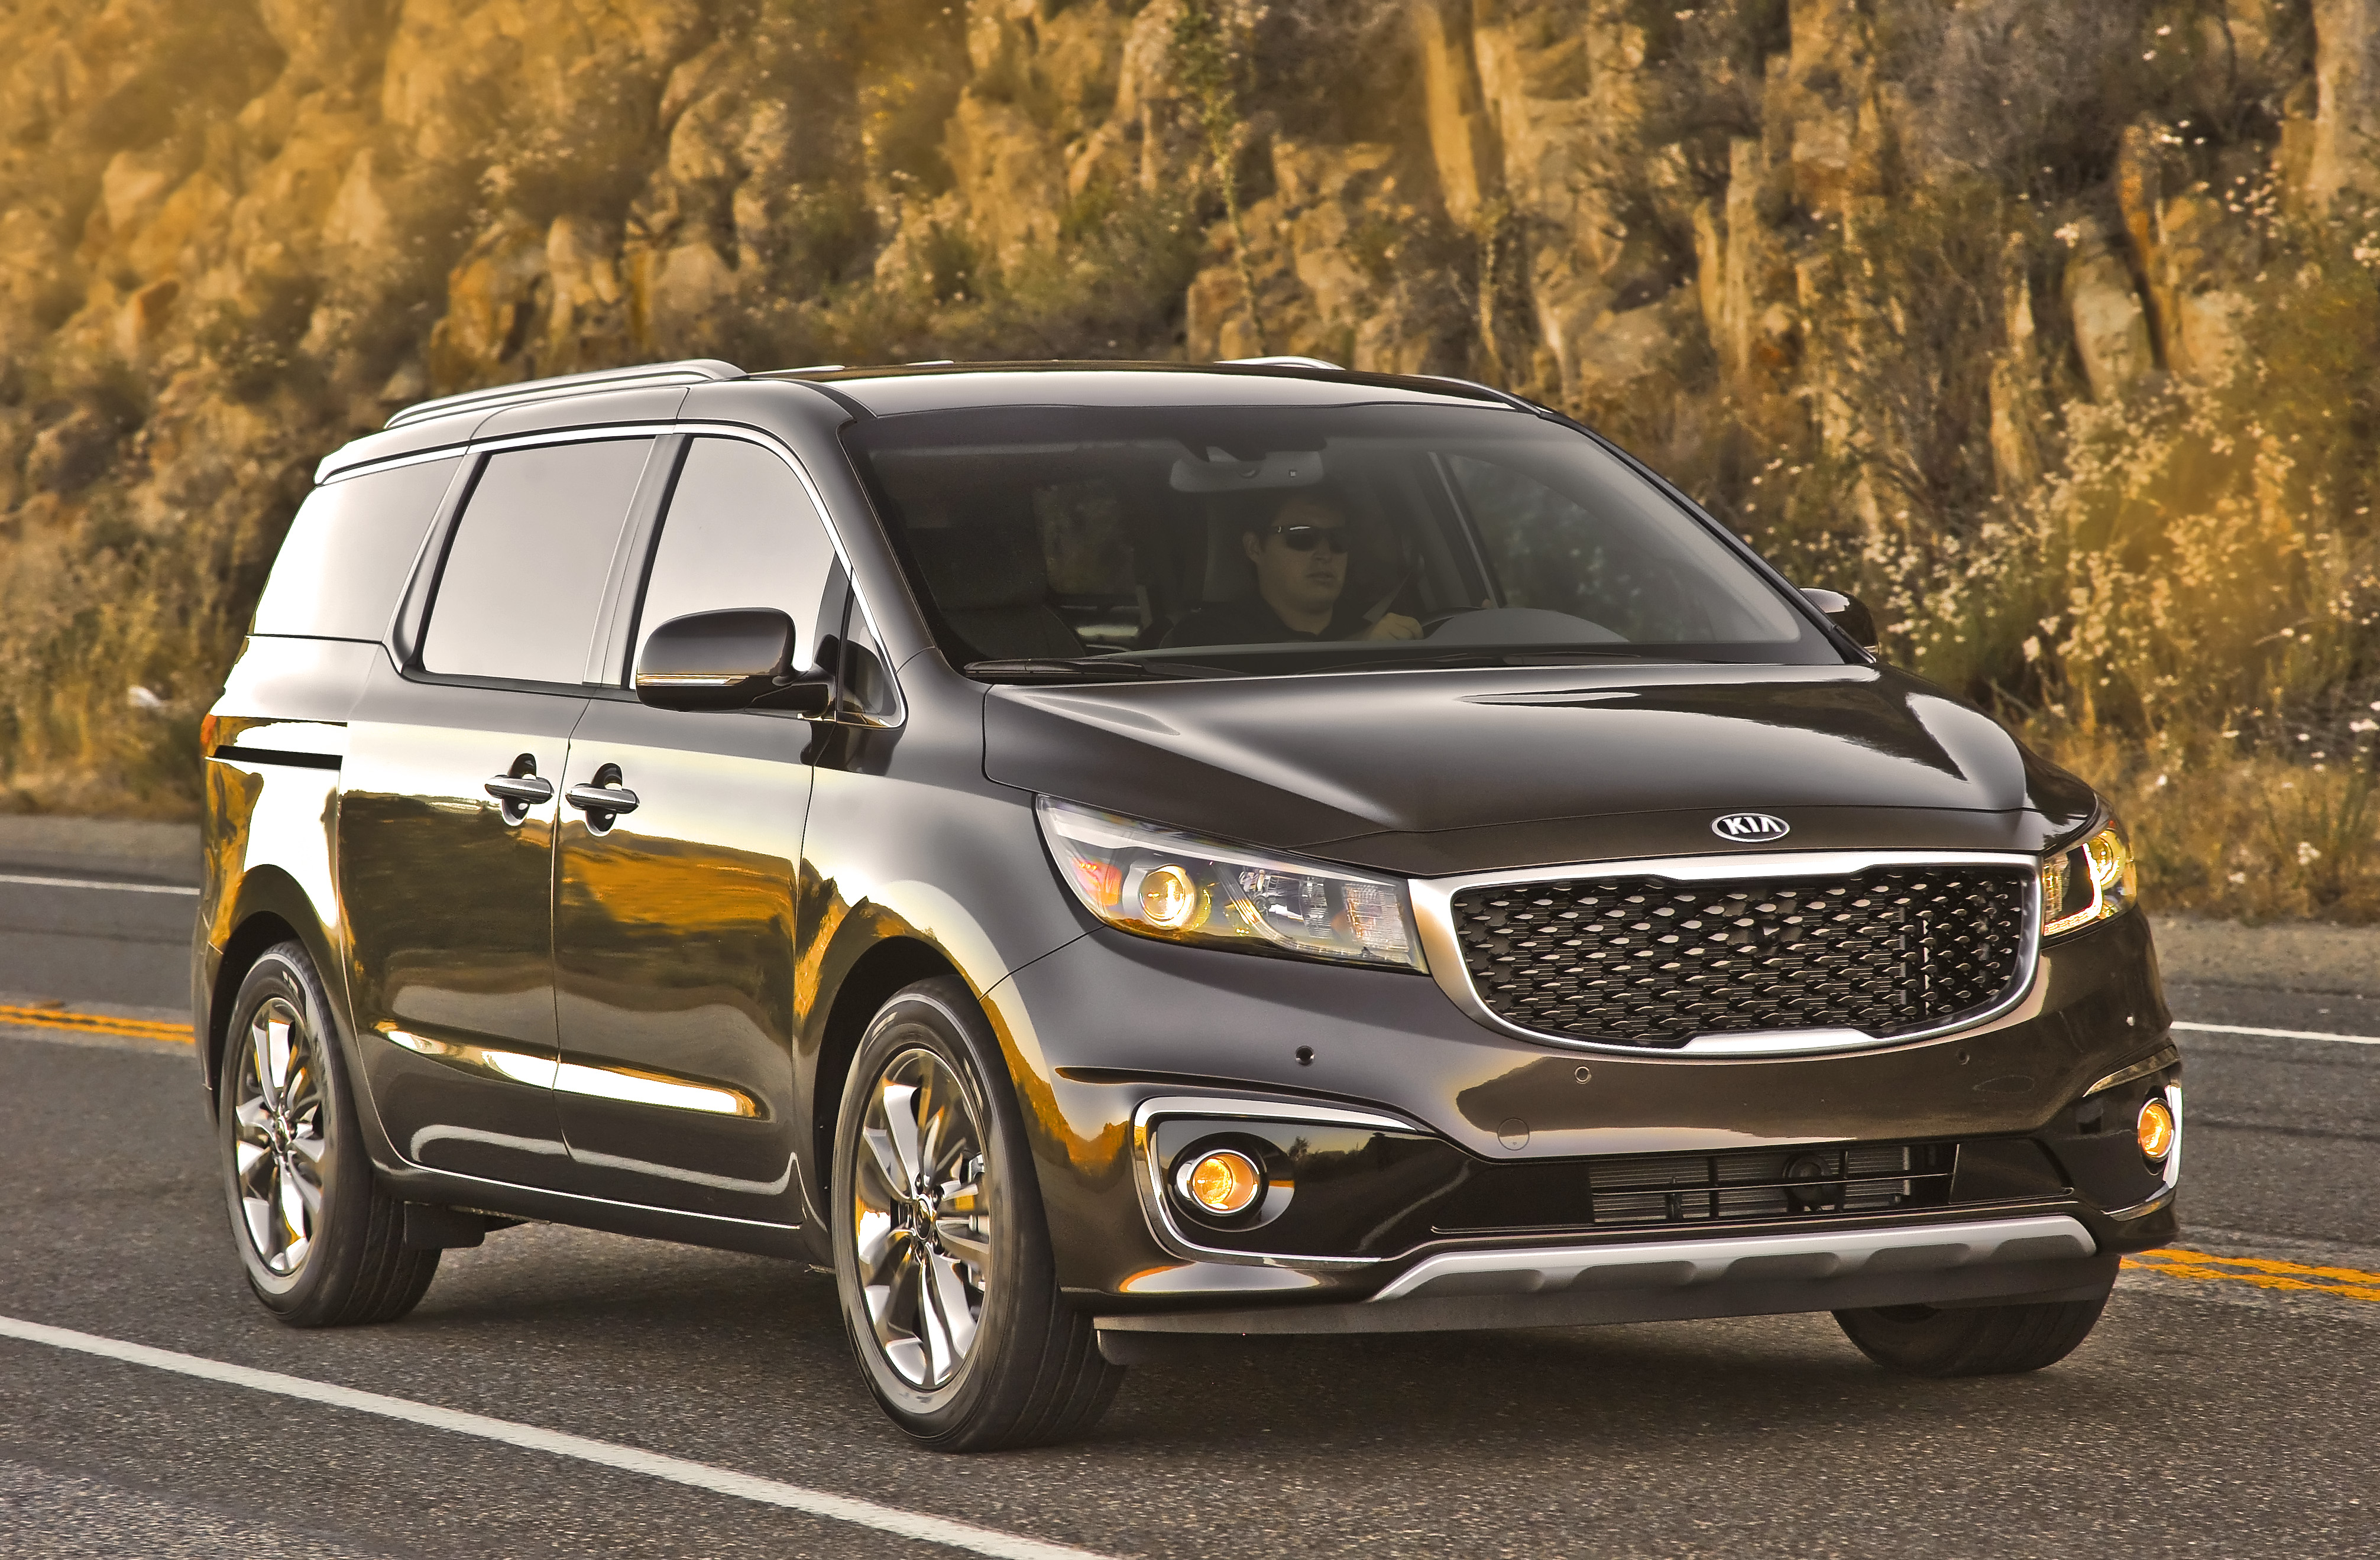 owned drive in kia inventory sedona ex passenger pre front premium cadenza used van wheel fredericksburg mini car